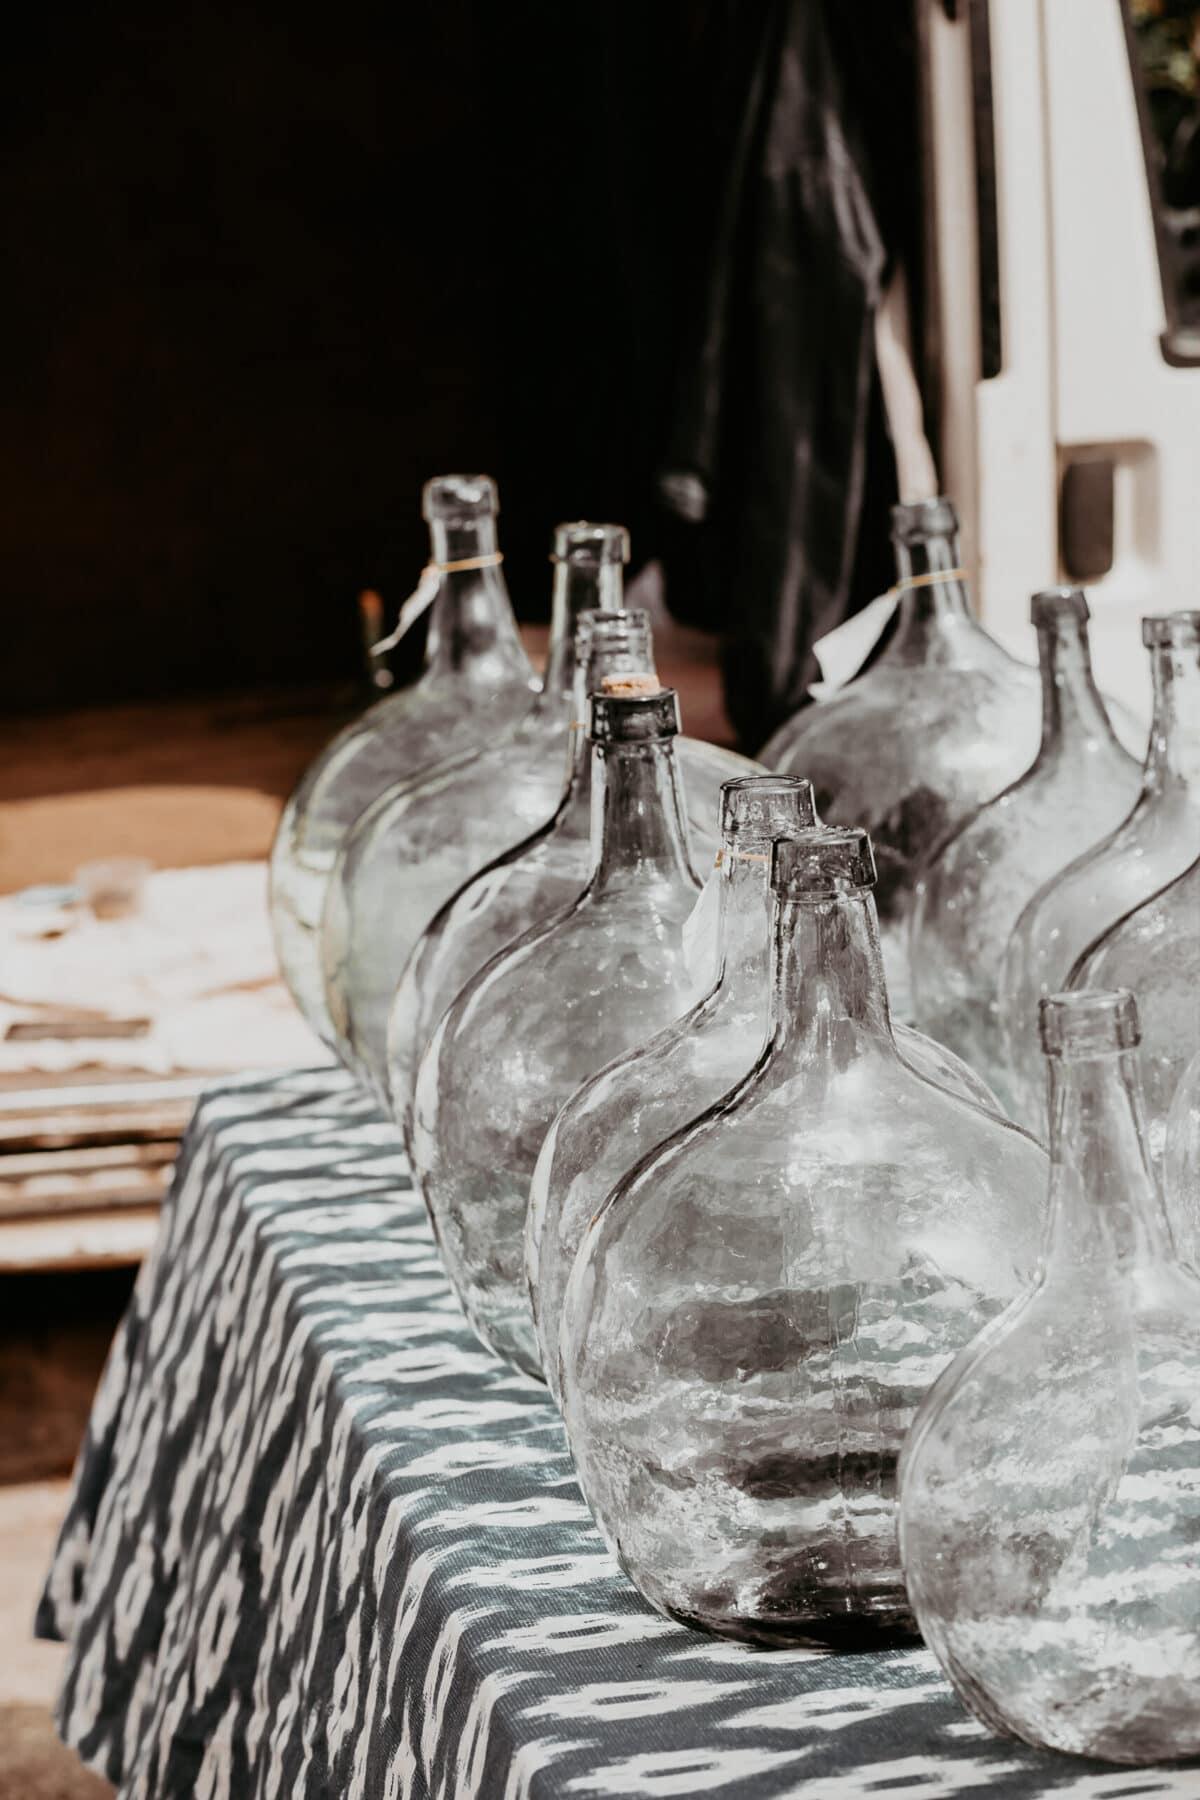 Glass bottles flea market Mallorca